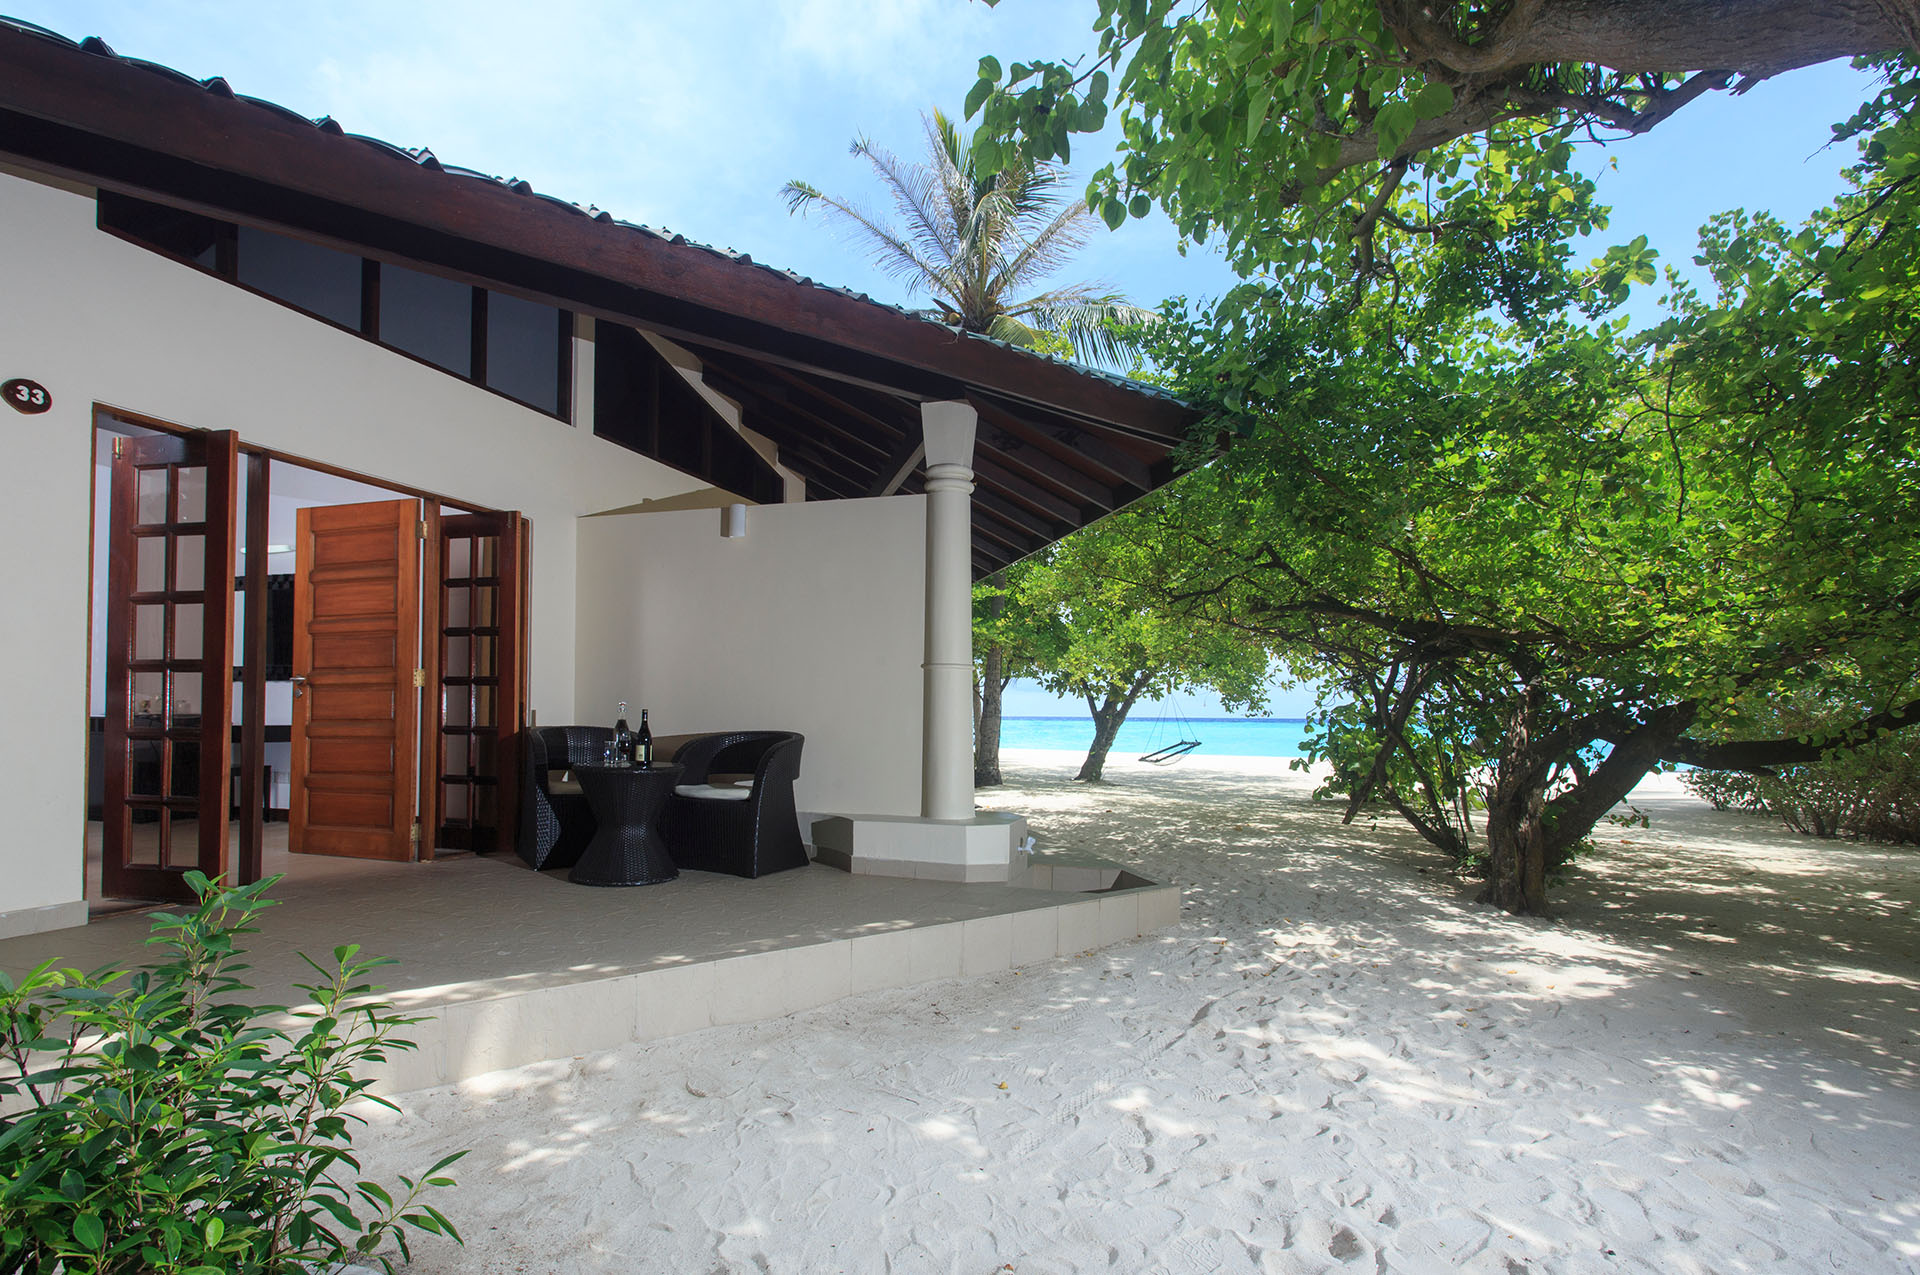 7 Nights Embudu Village Maldives Holiday